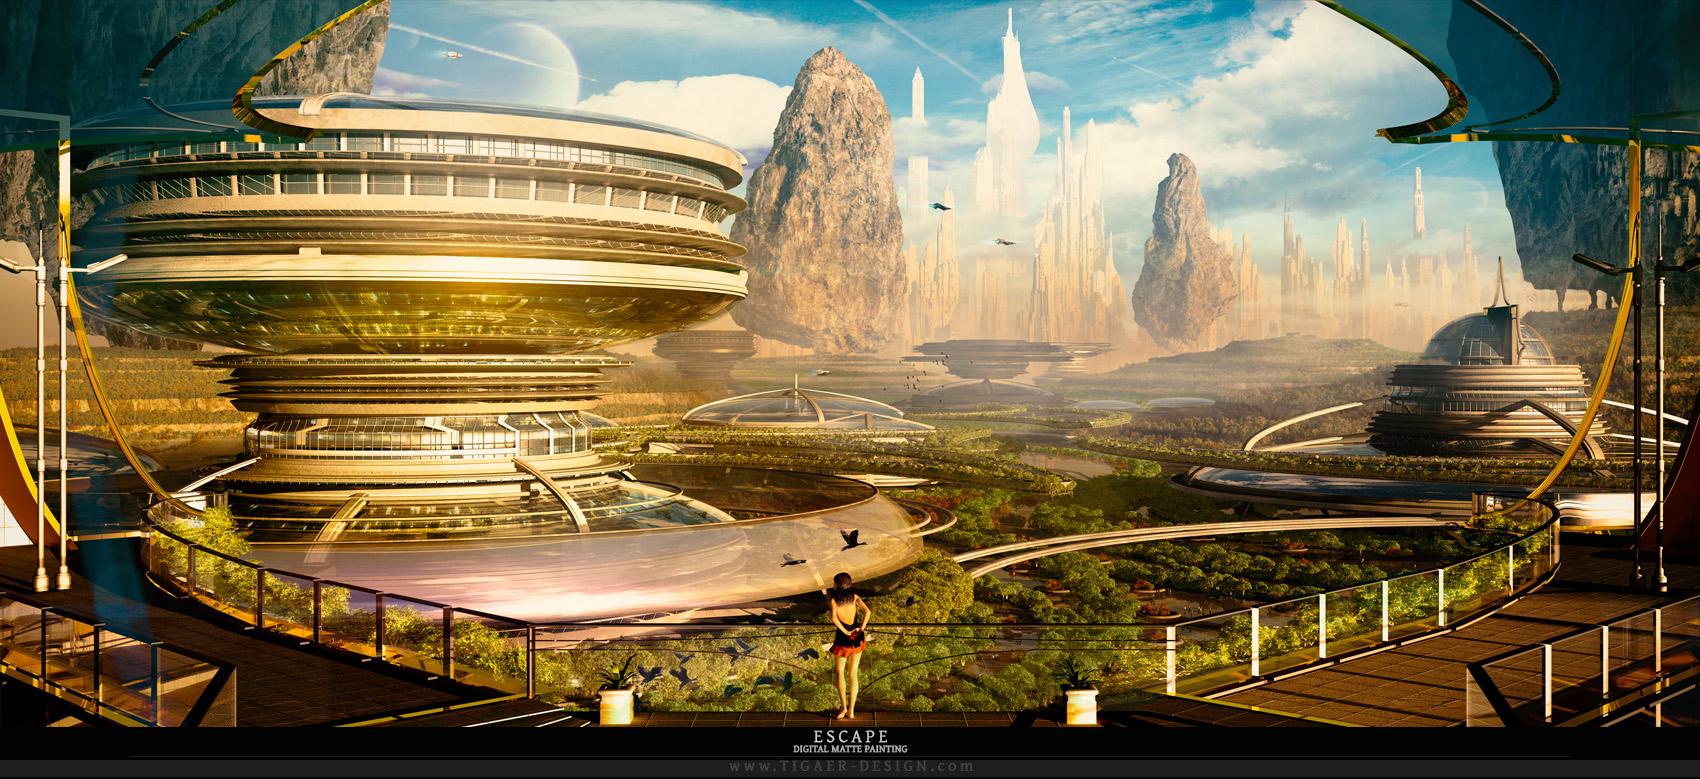 The Sci-Fi Art of Christian 'Tigaer' Hecker | Digital Artist